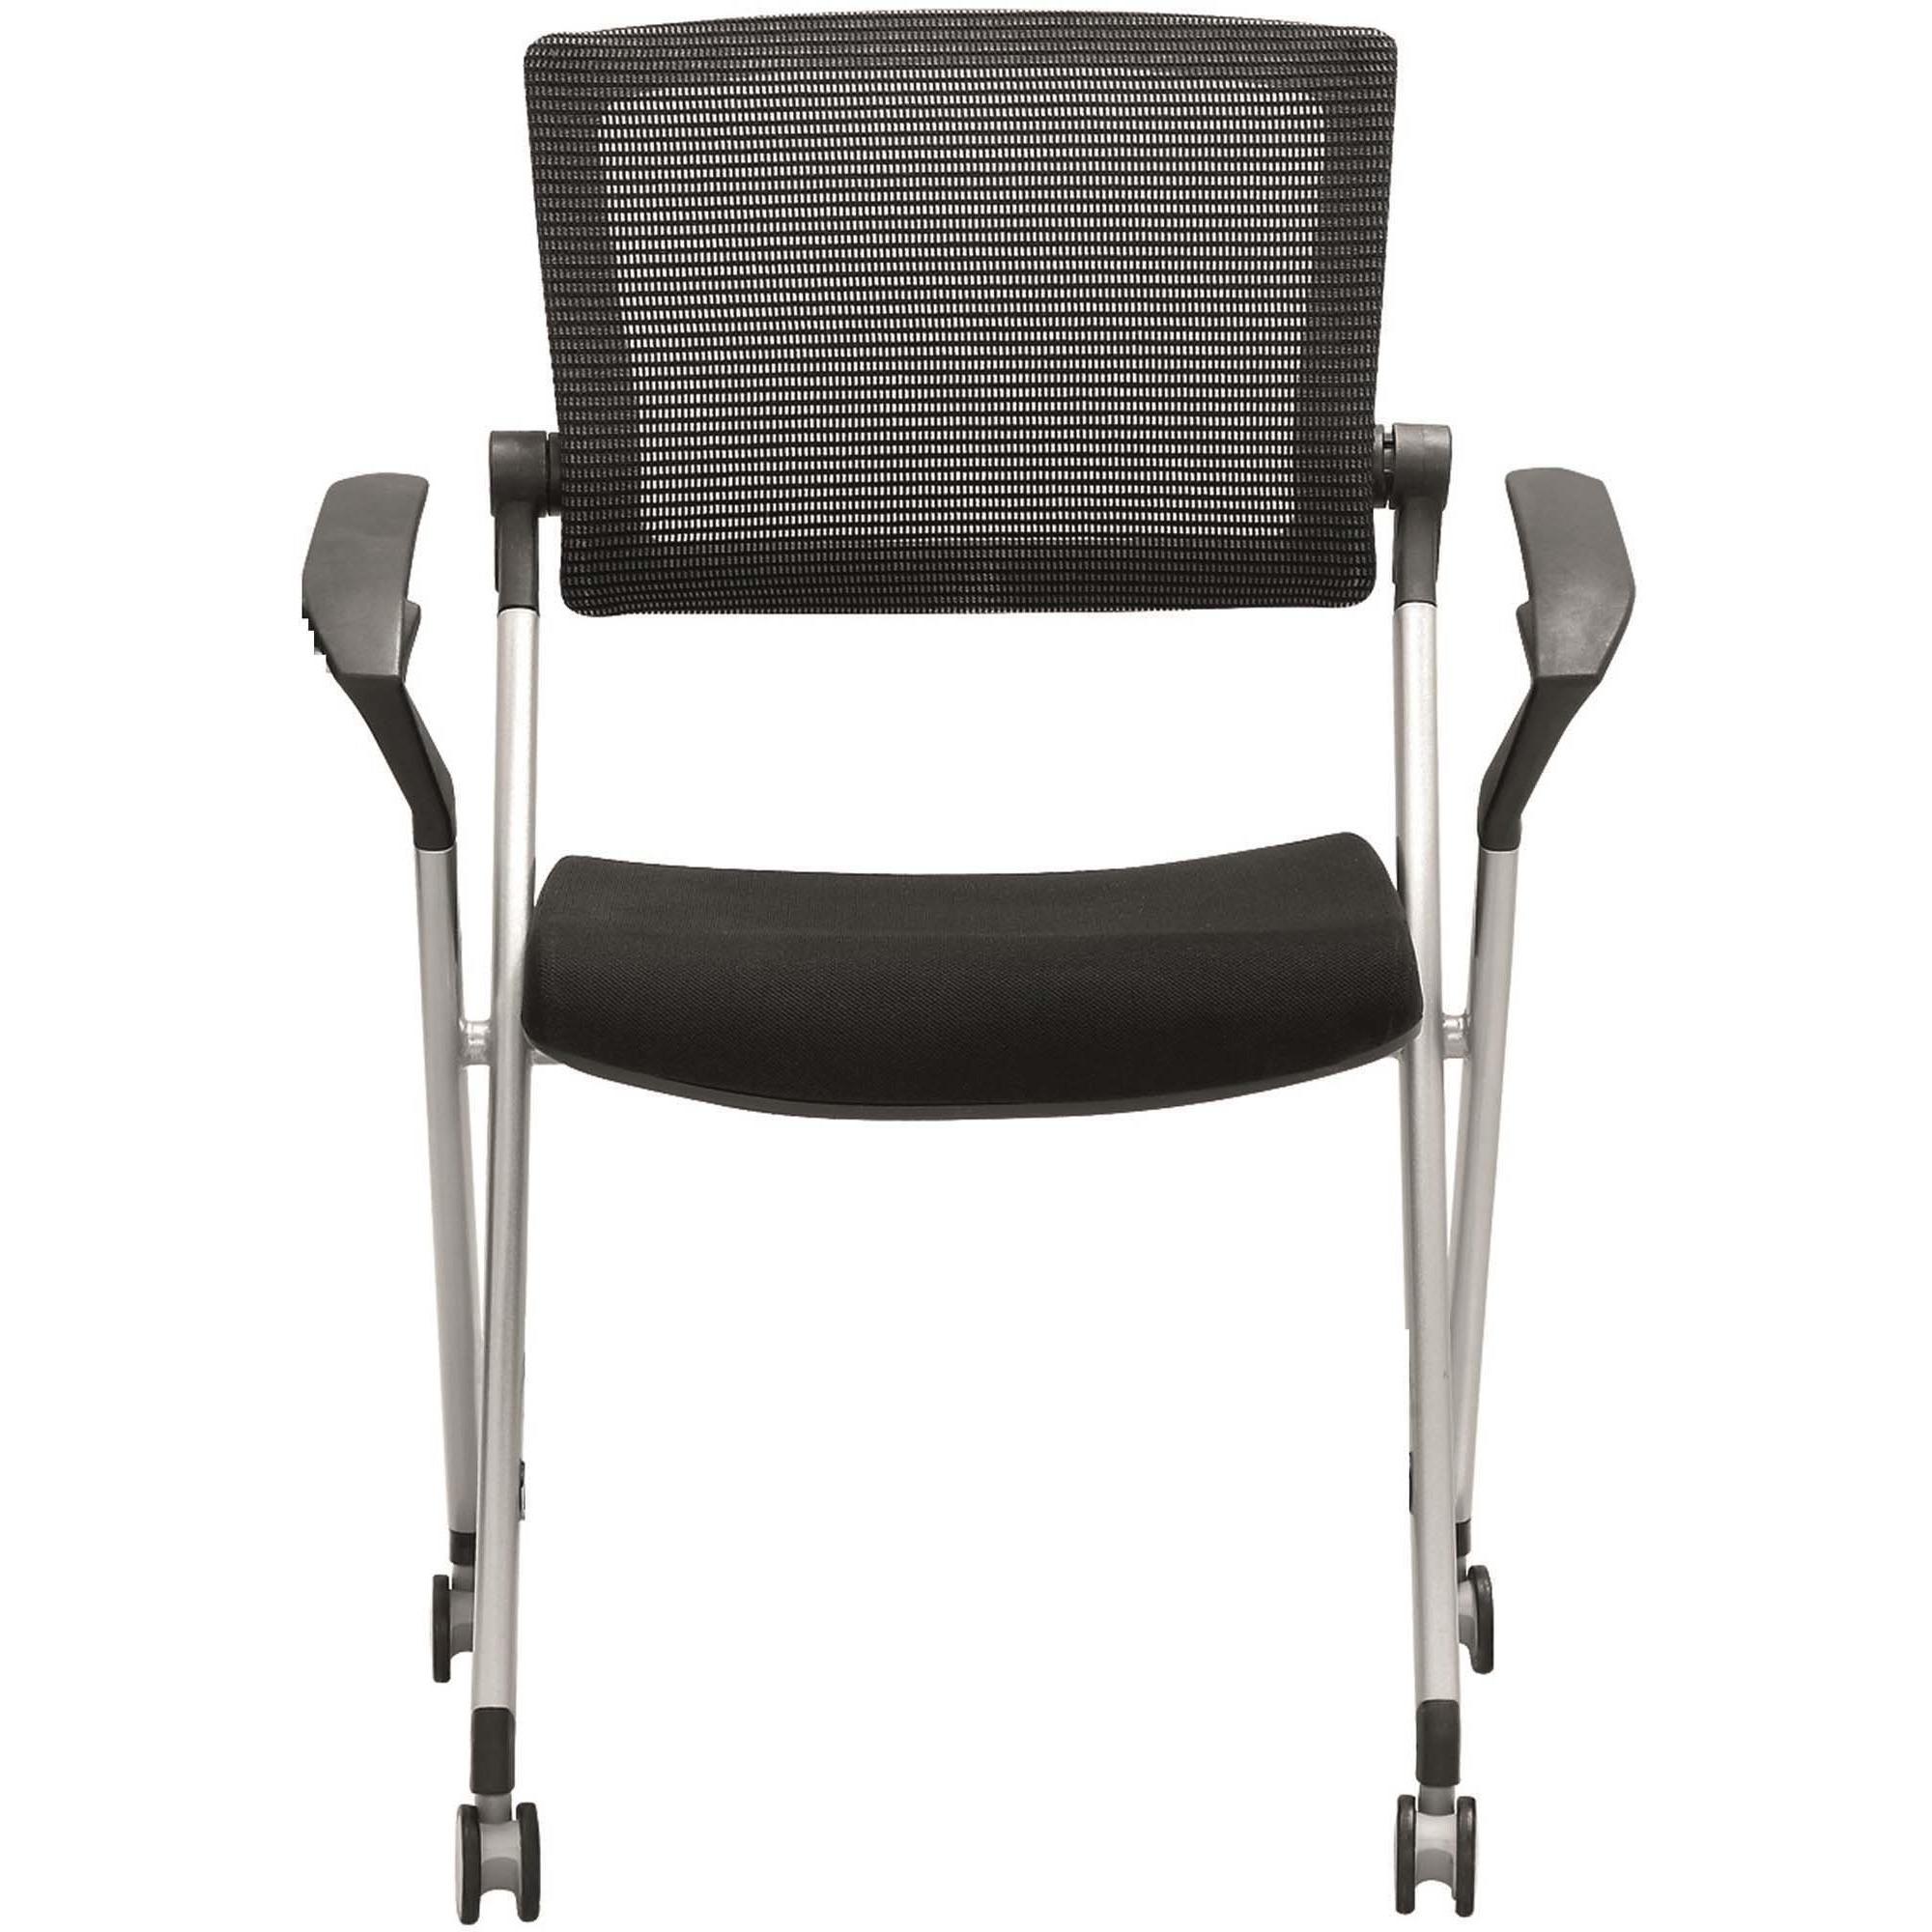 Heartwood Mesa Nesting Stacking Chair   Fabric Black, High Density Foam  (HDF) Seat   Fabric Black Back   Metal Powder Coated, Gray Frame    Four Legged Base ...